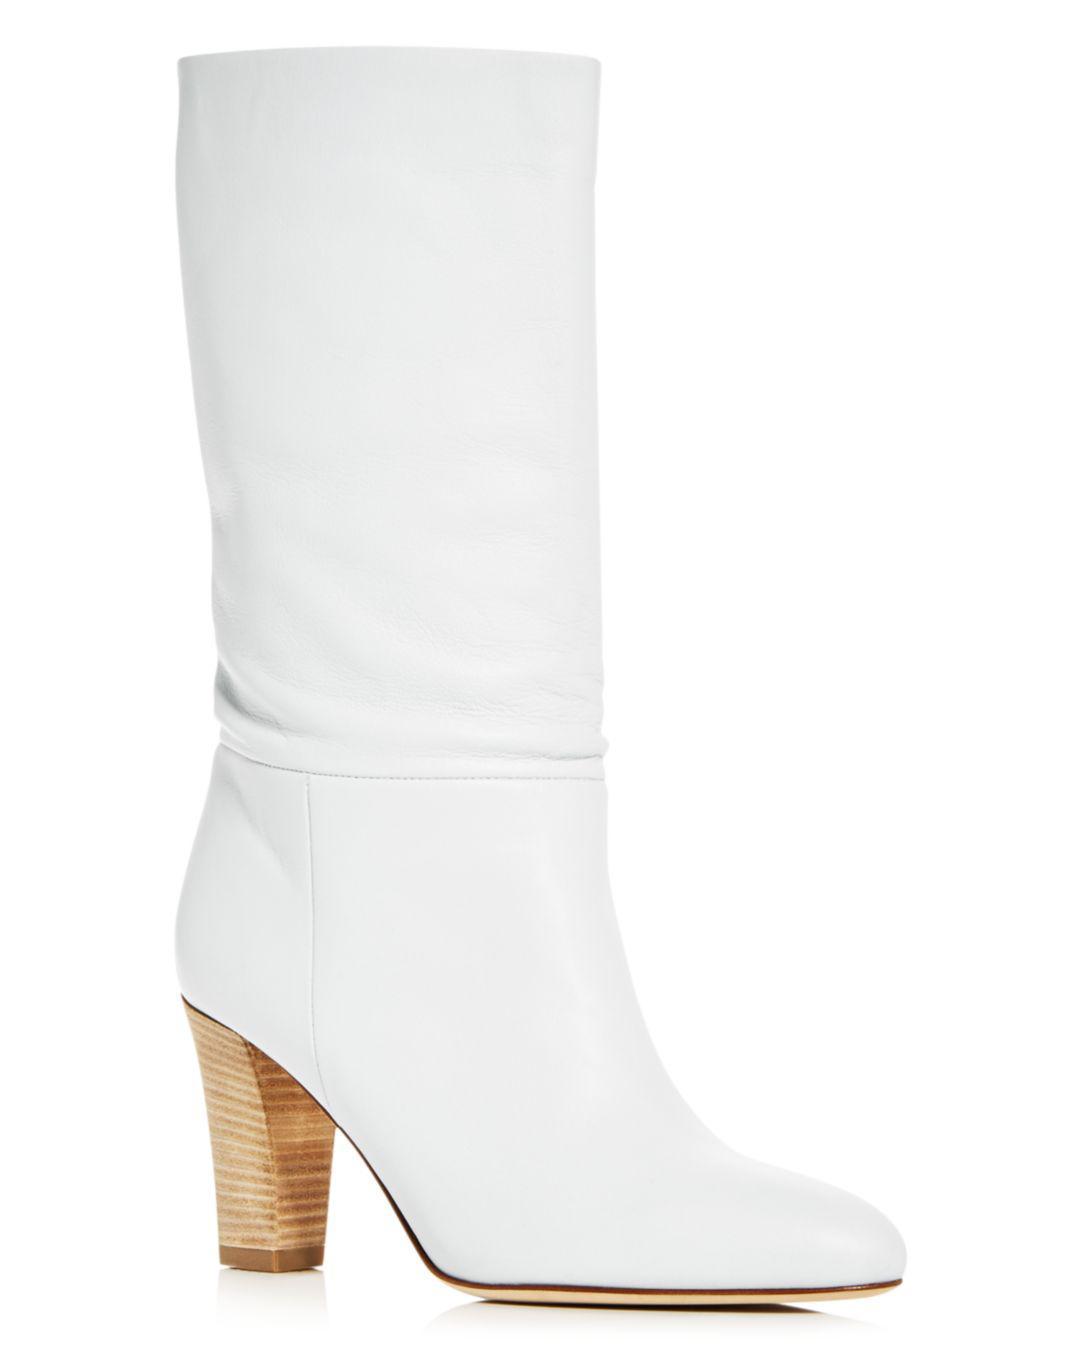 80caf30d7813 Lyst - SJP by Sarah Jessica Parker Women s Reign High-heel Boots in ...